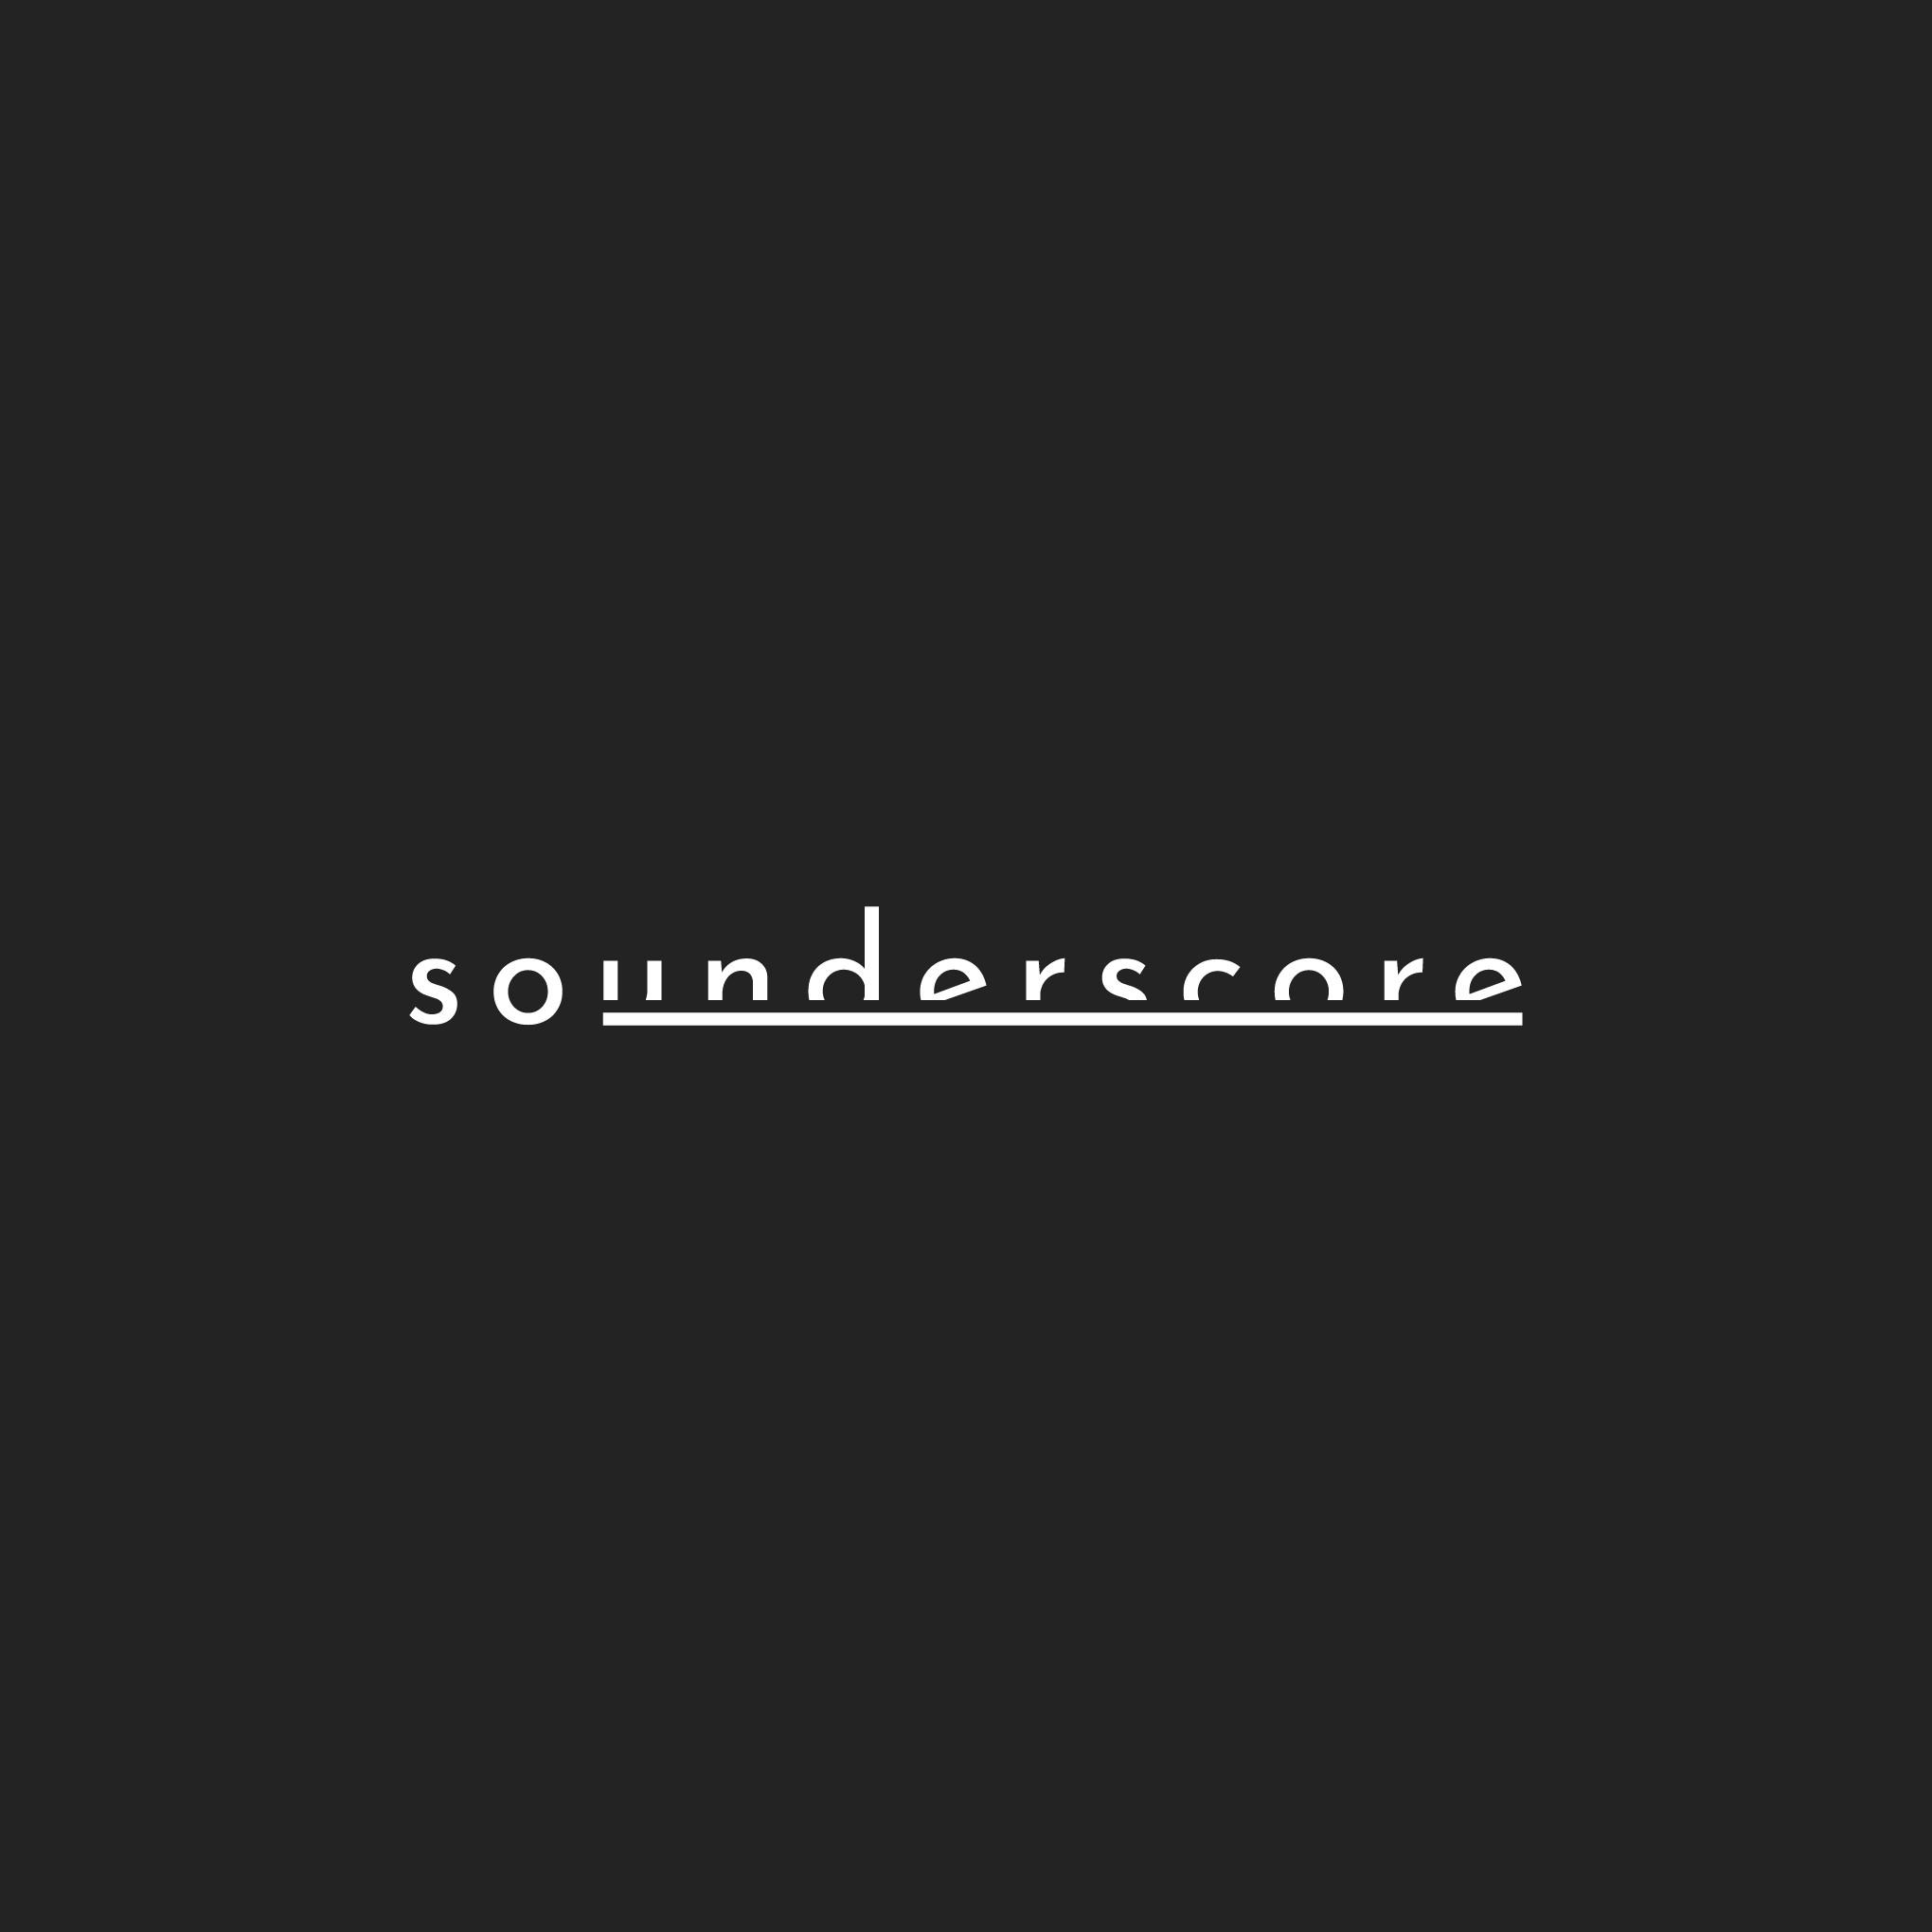 New York based jazz record label needs logo